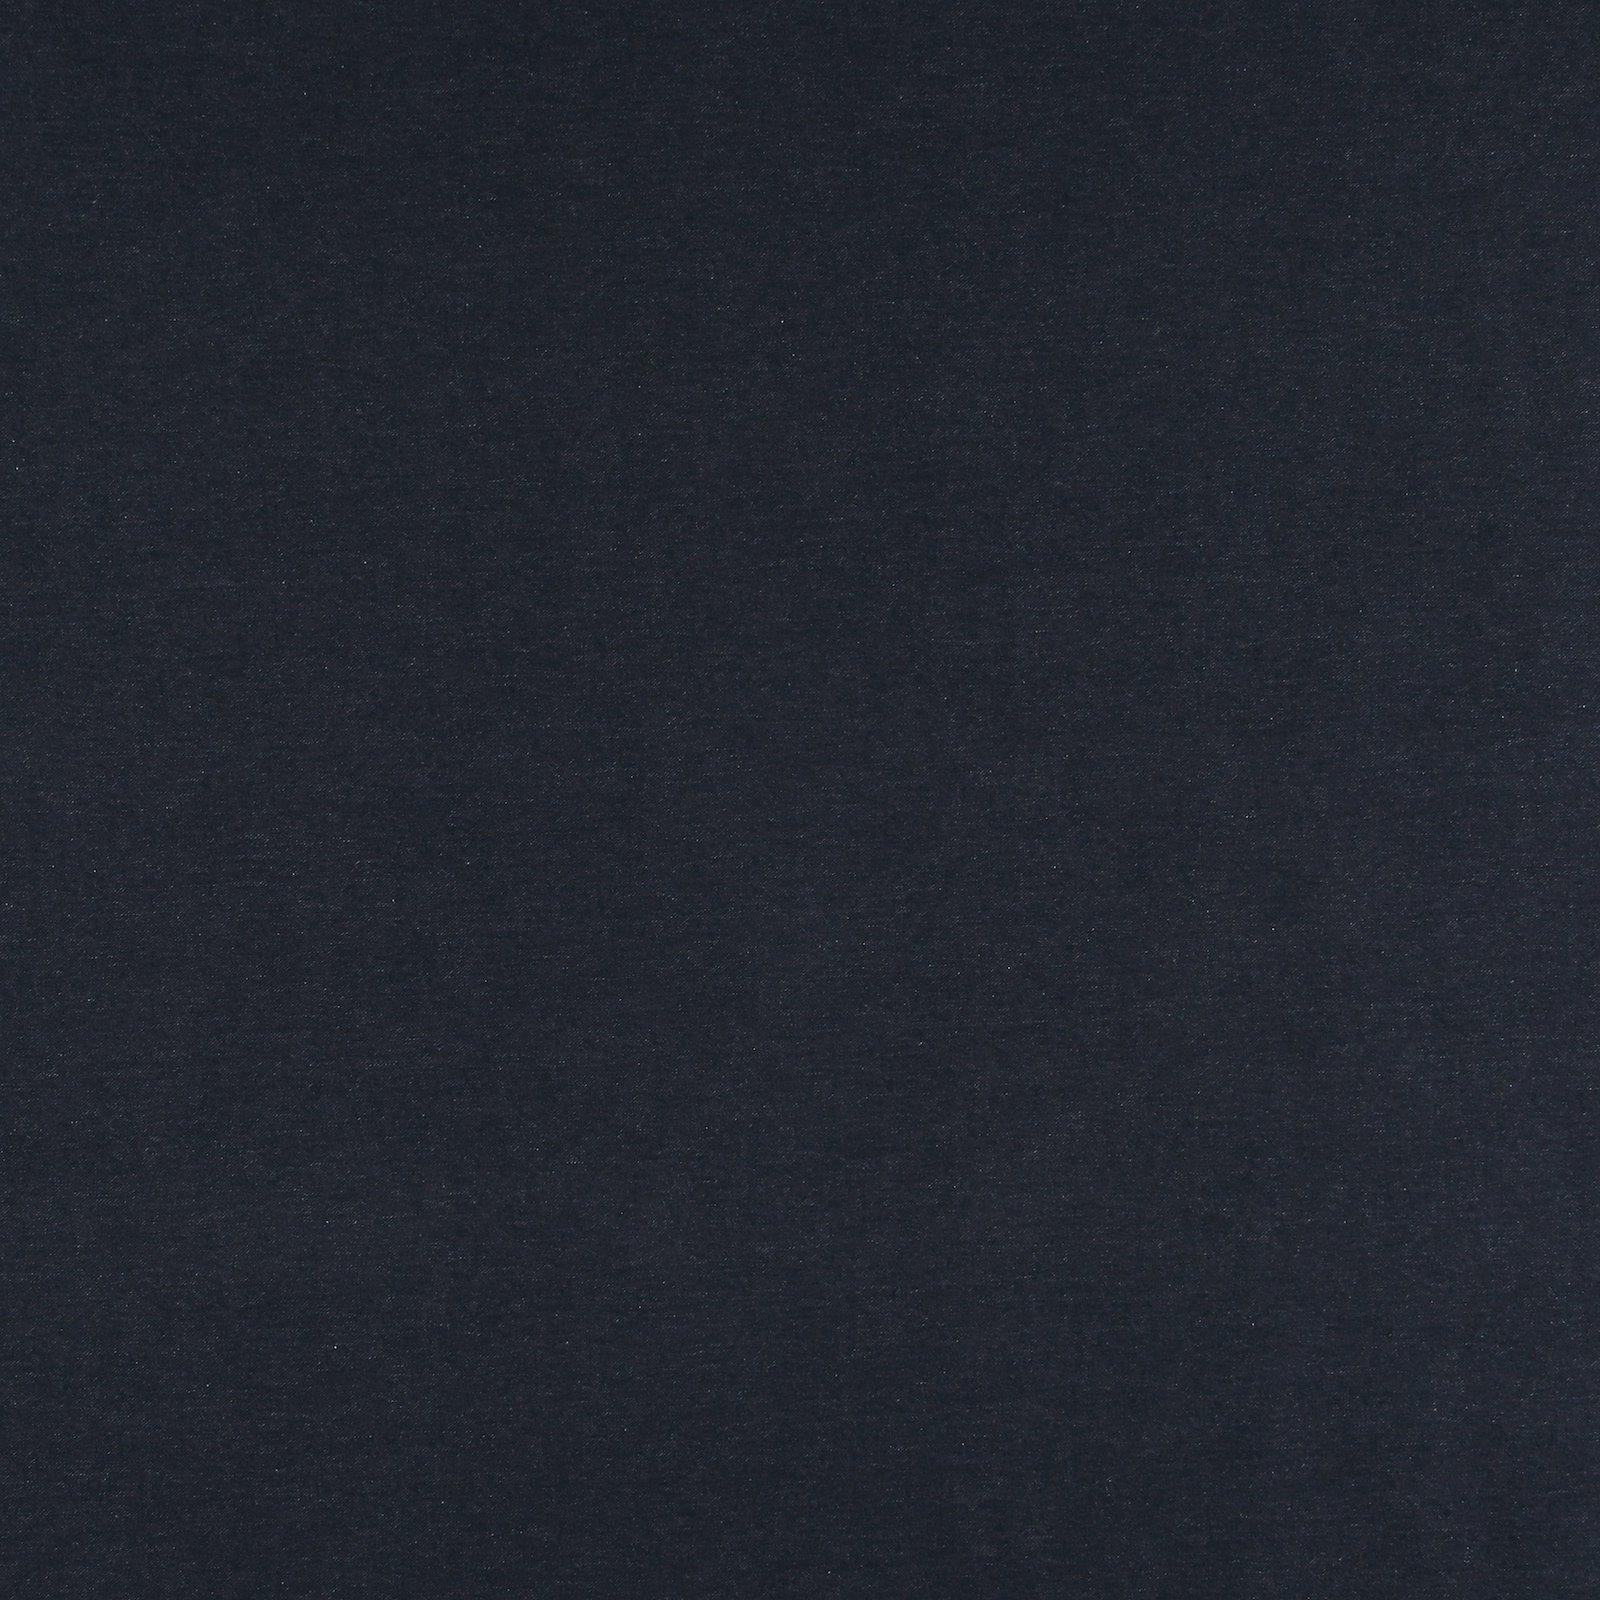 Stretch jersey denim look dark denimblue 206141_pack_solid